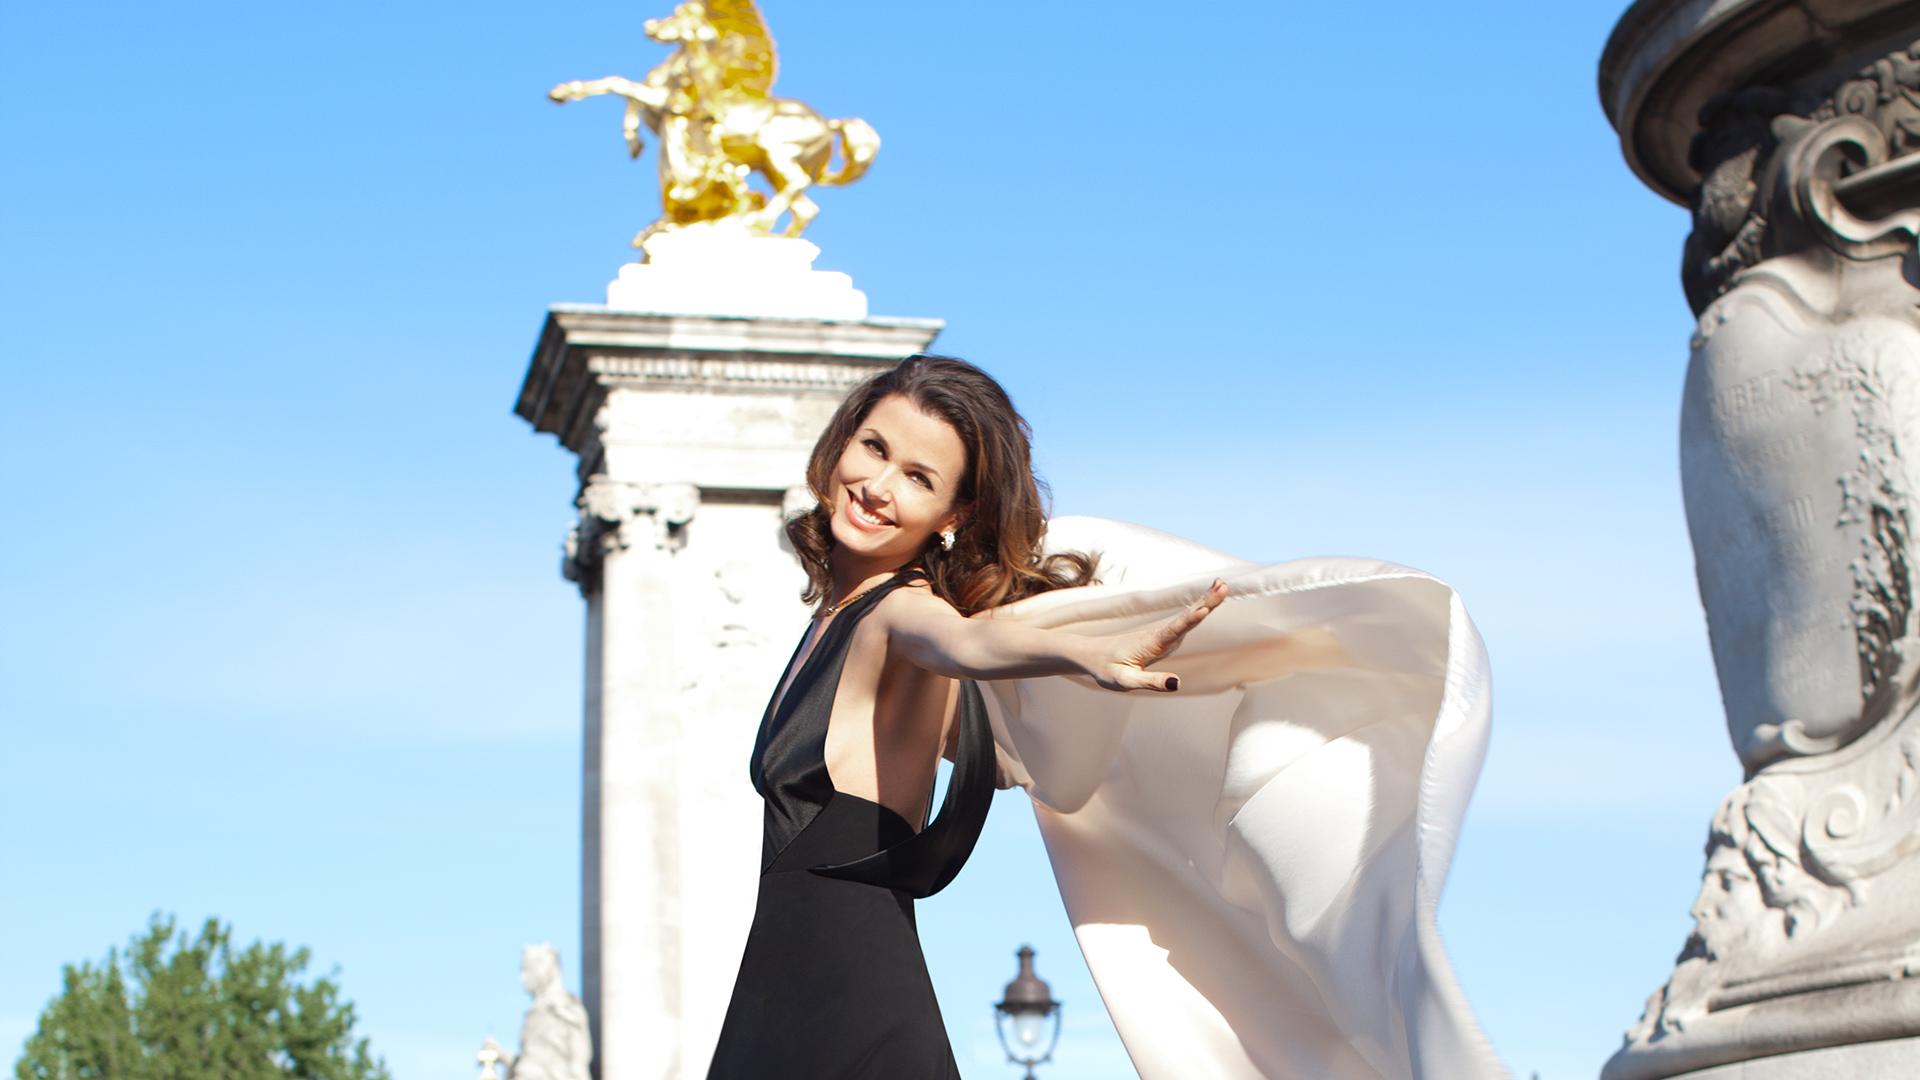 We'll always have Paris, Bridget Moynahan